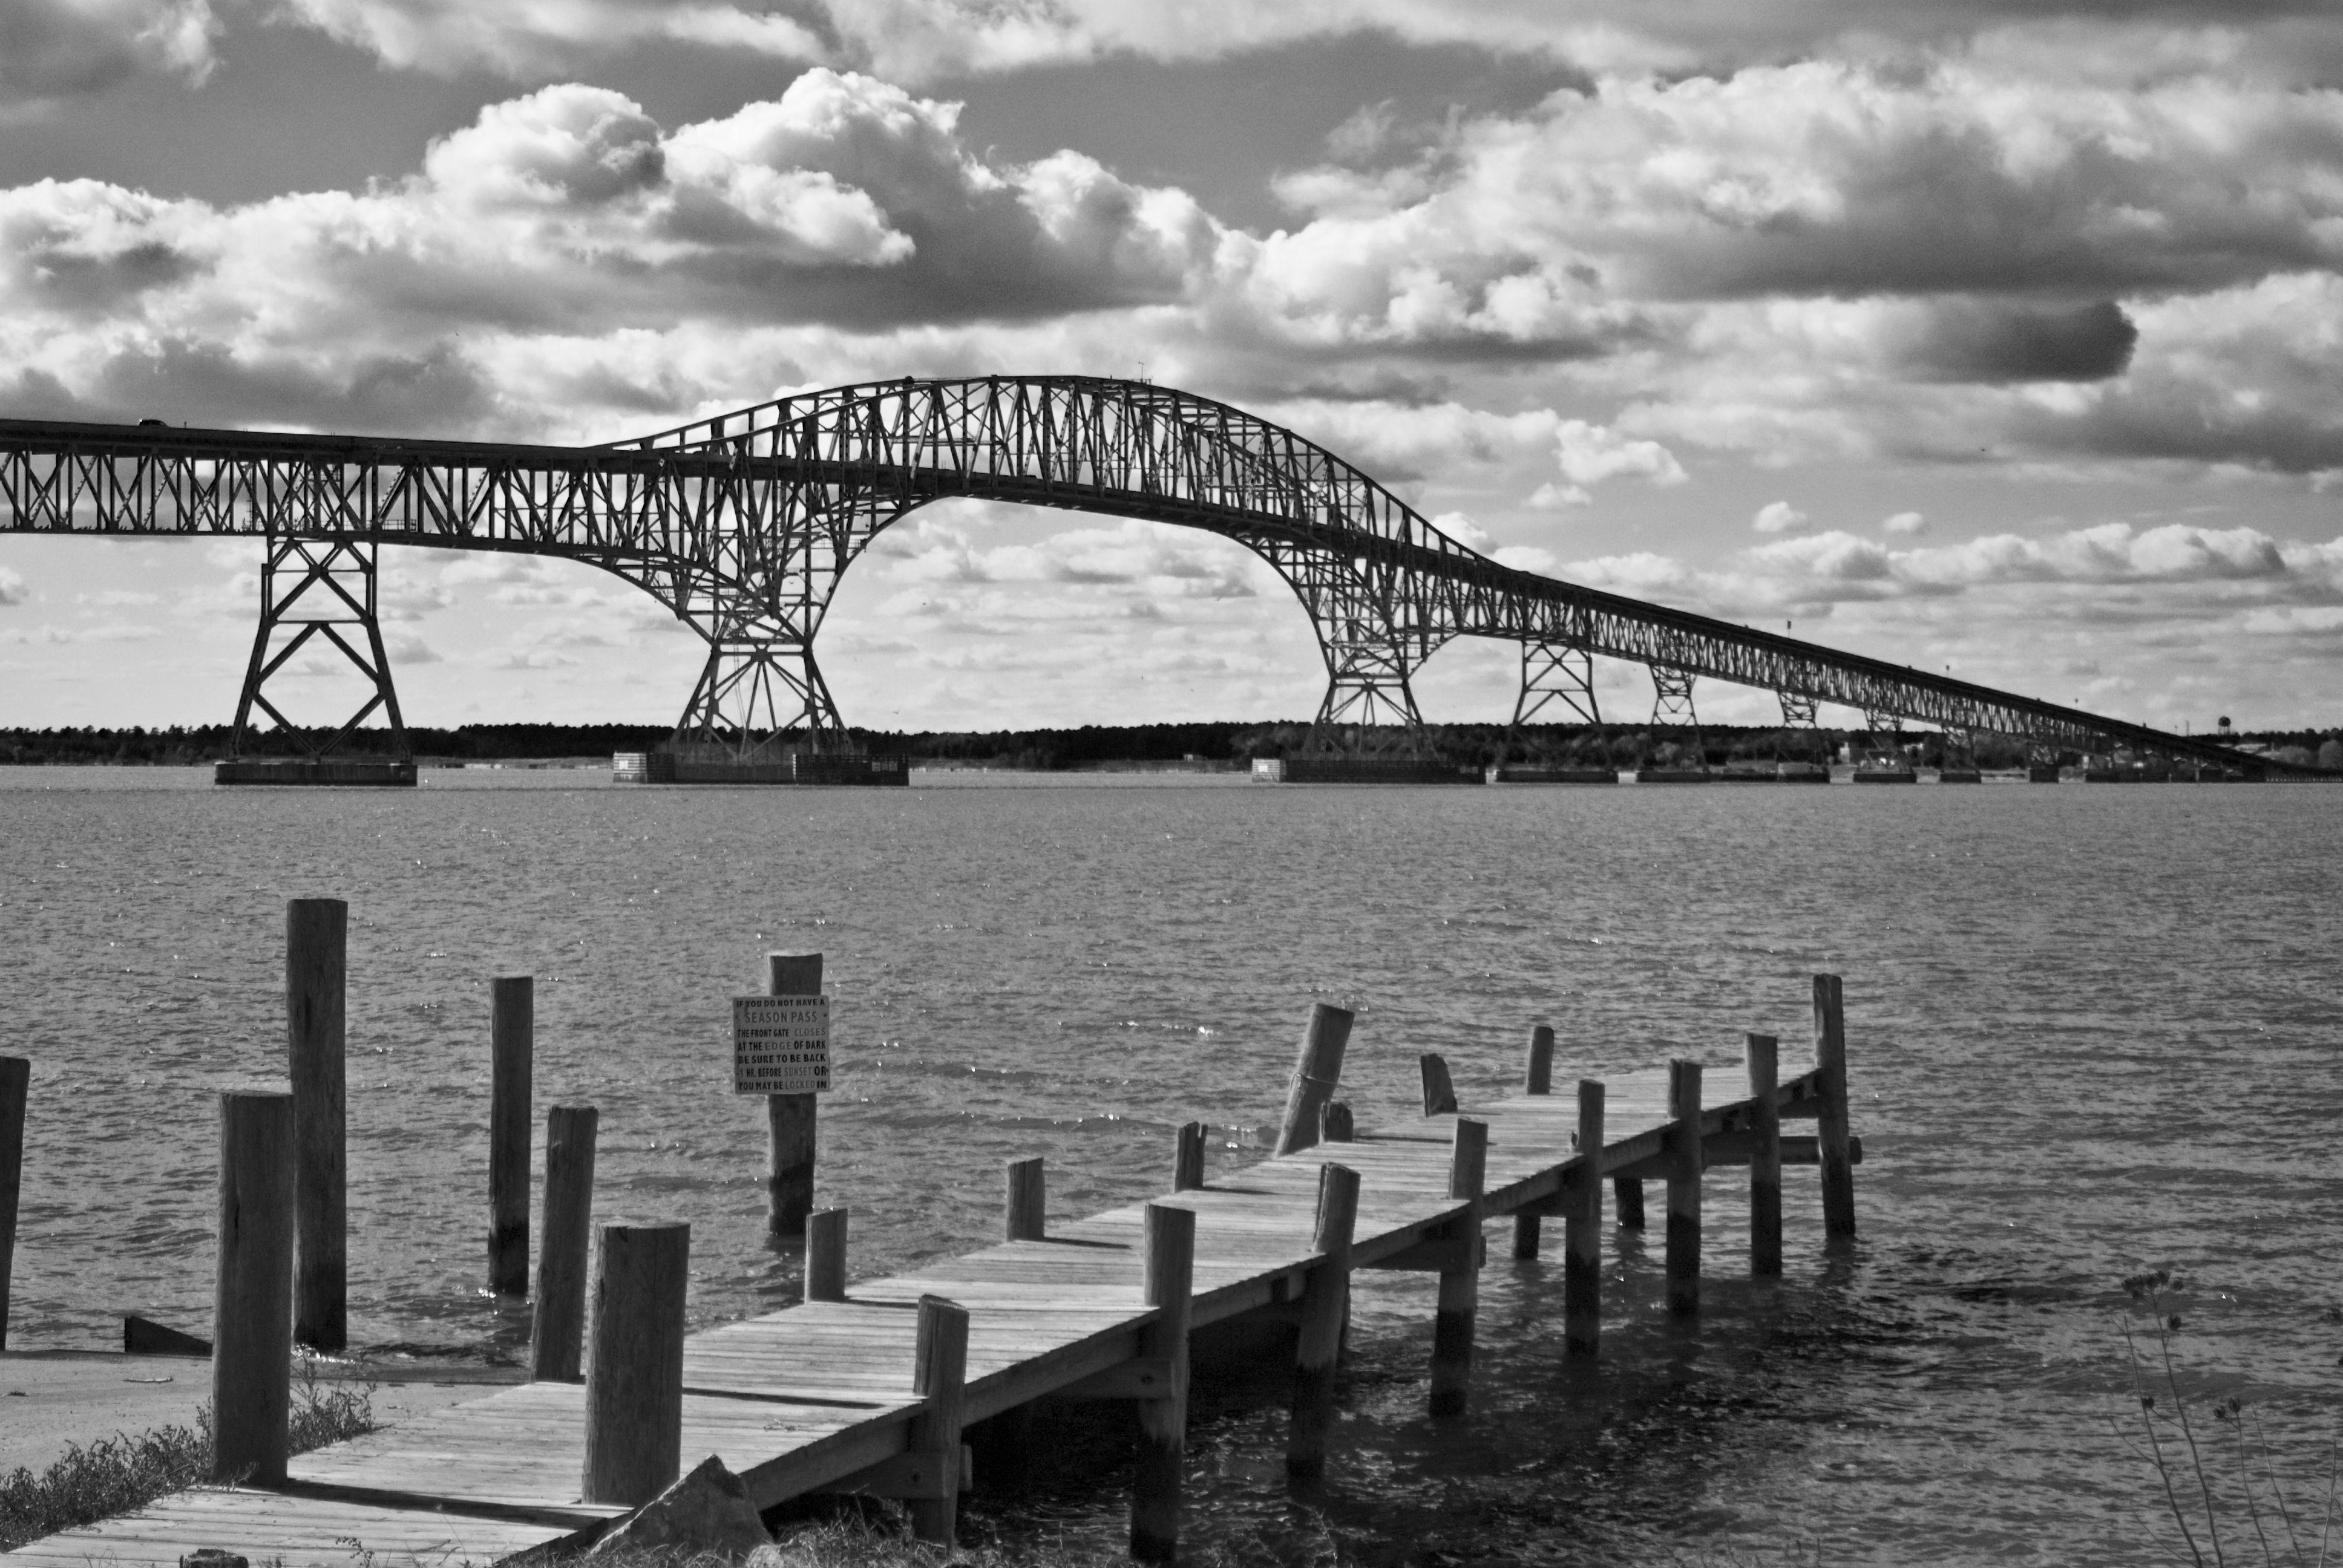 Gov. Harry Nice Bridge (Route 301 Over The Potomac River